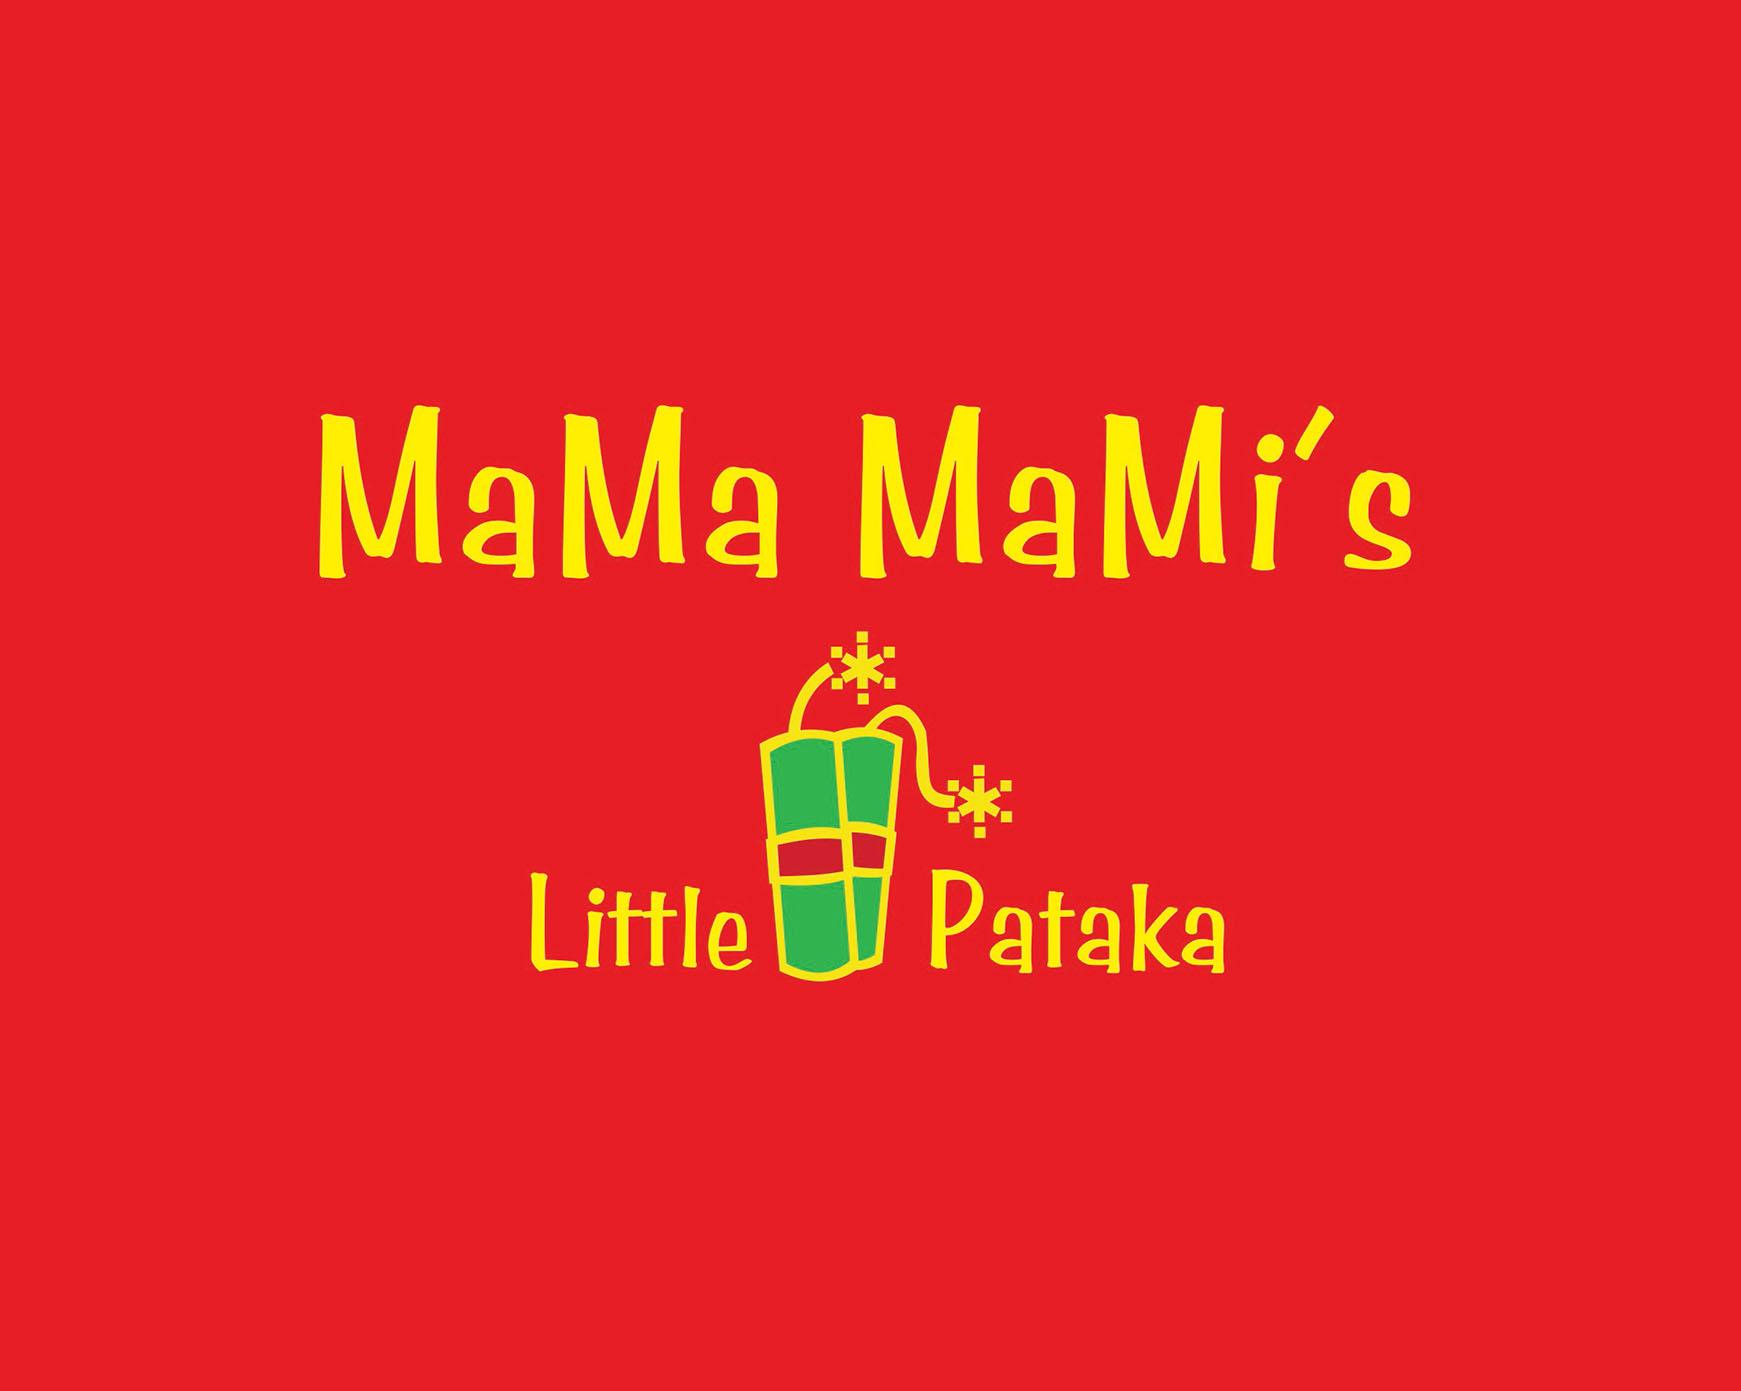 229-mama-mamis-little-pataka.jpg